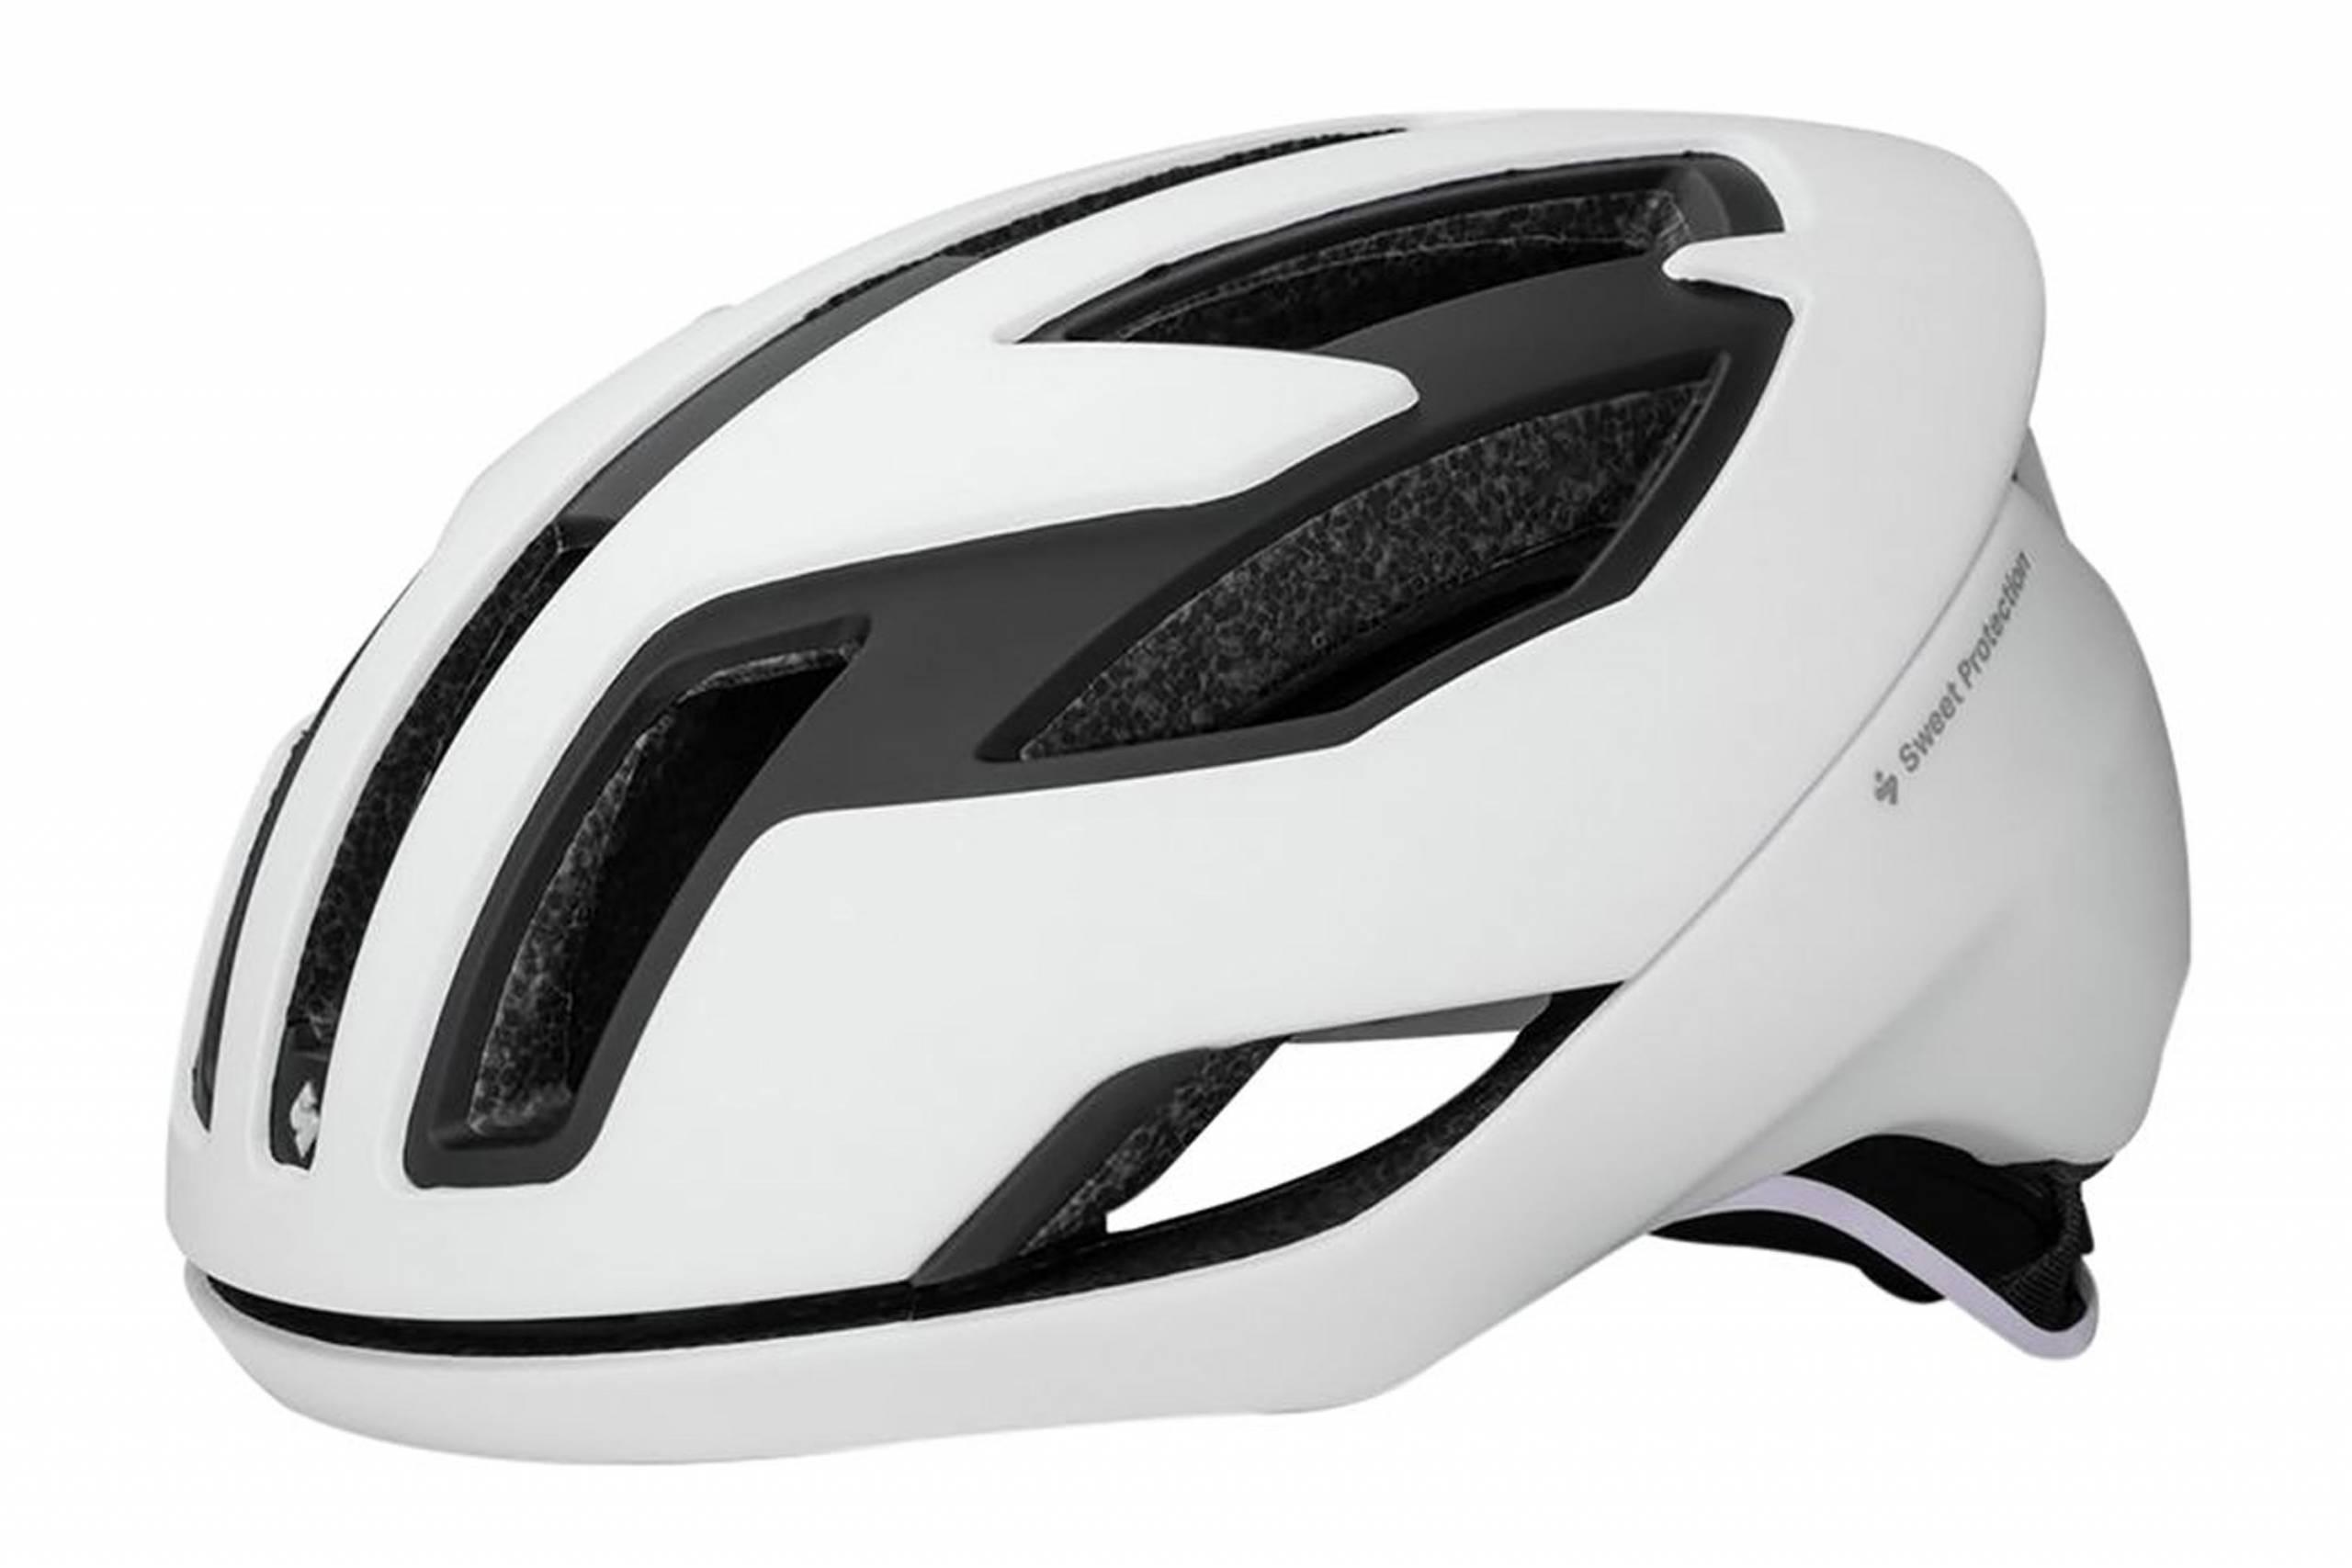 GearJunkie_Gravel_helmet_Sweet_Protection_Falconer_II_MIPS_CPSC